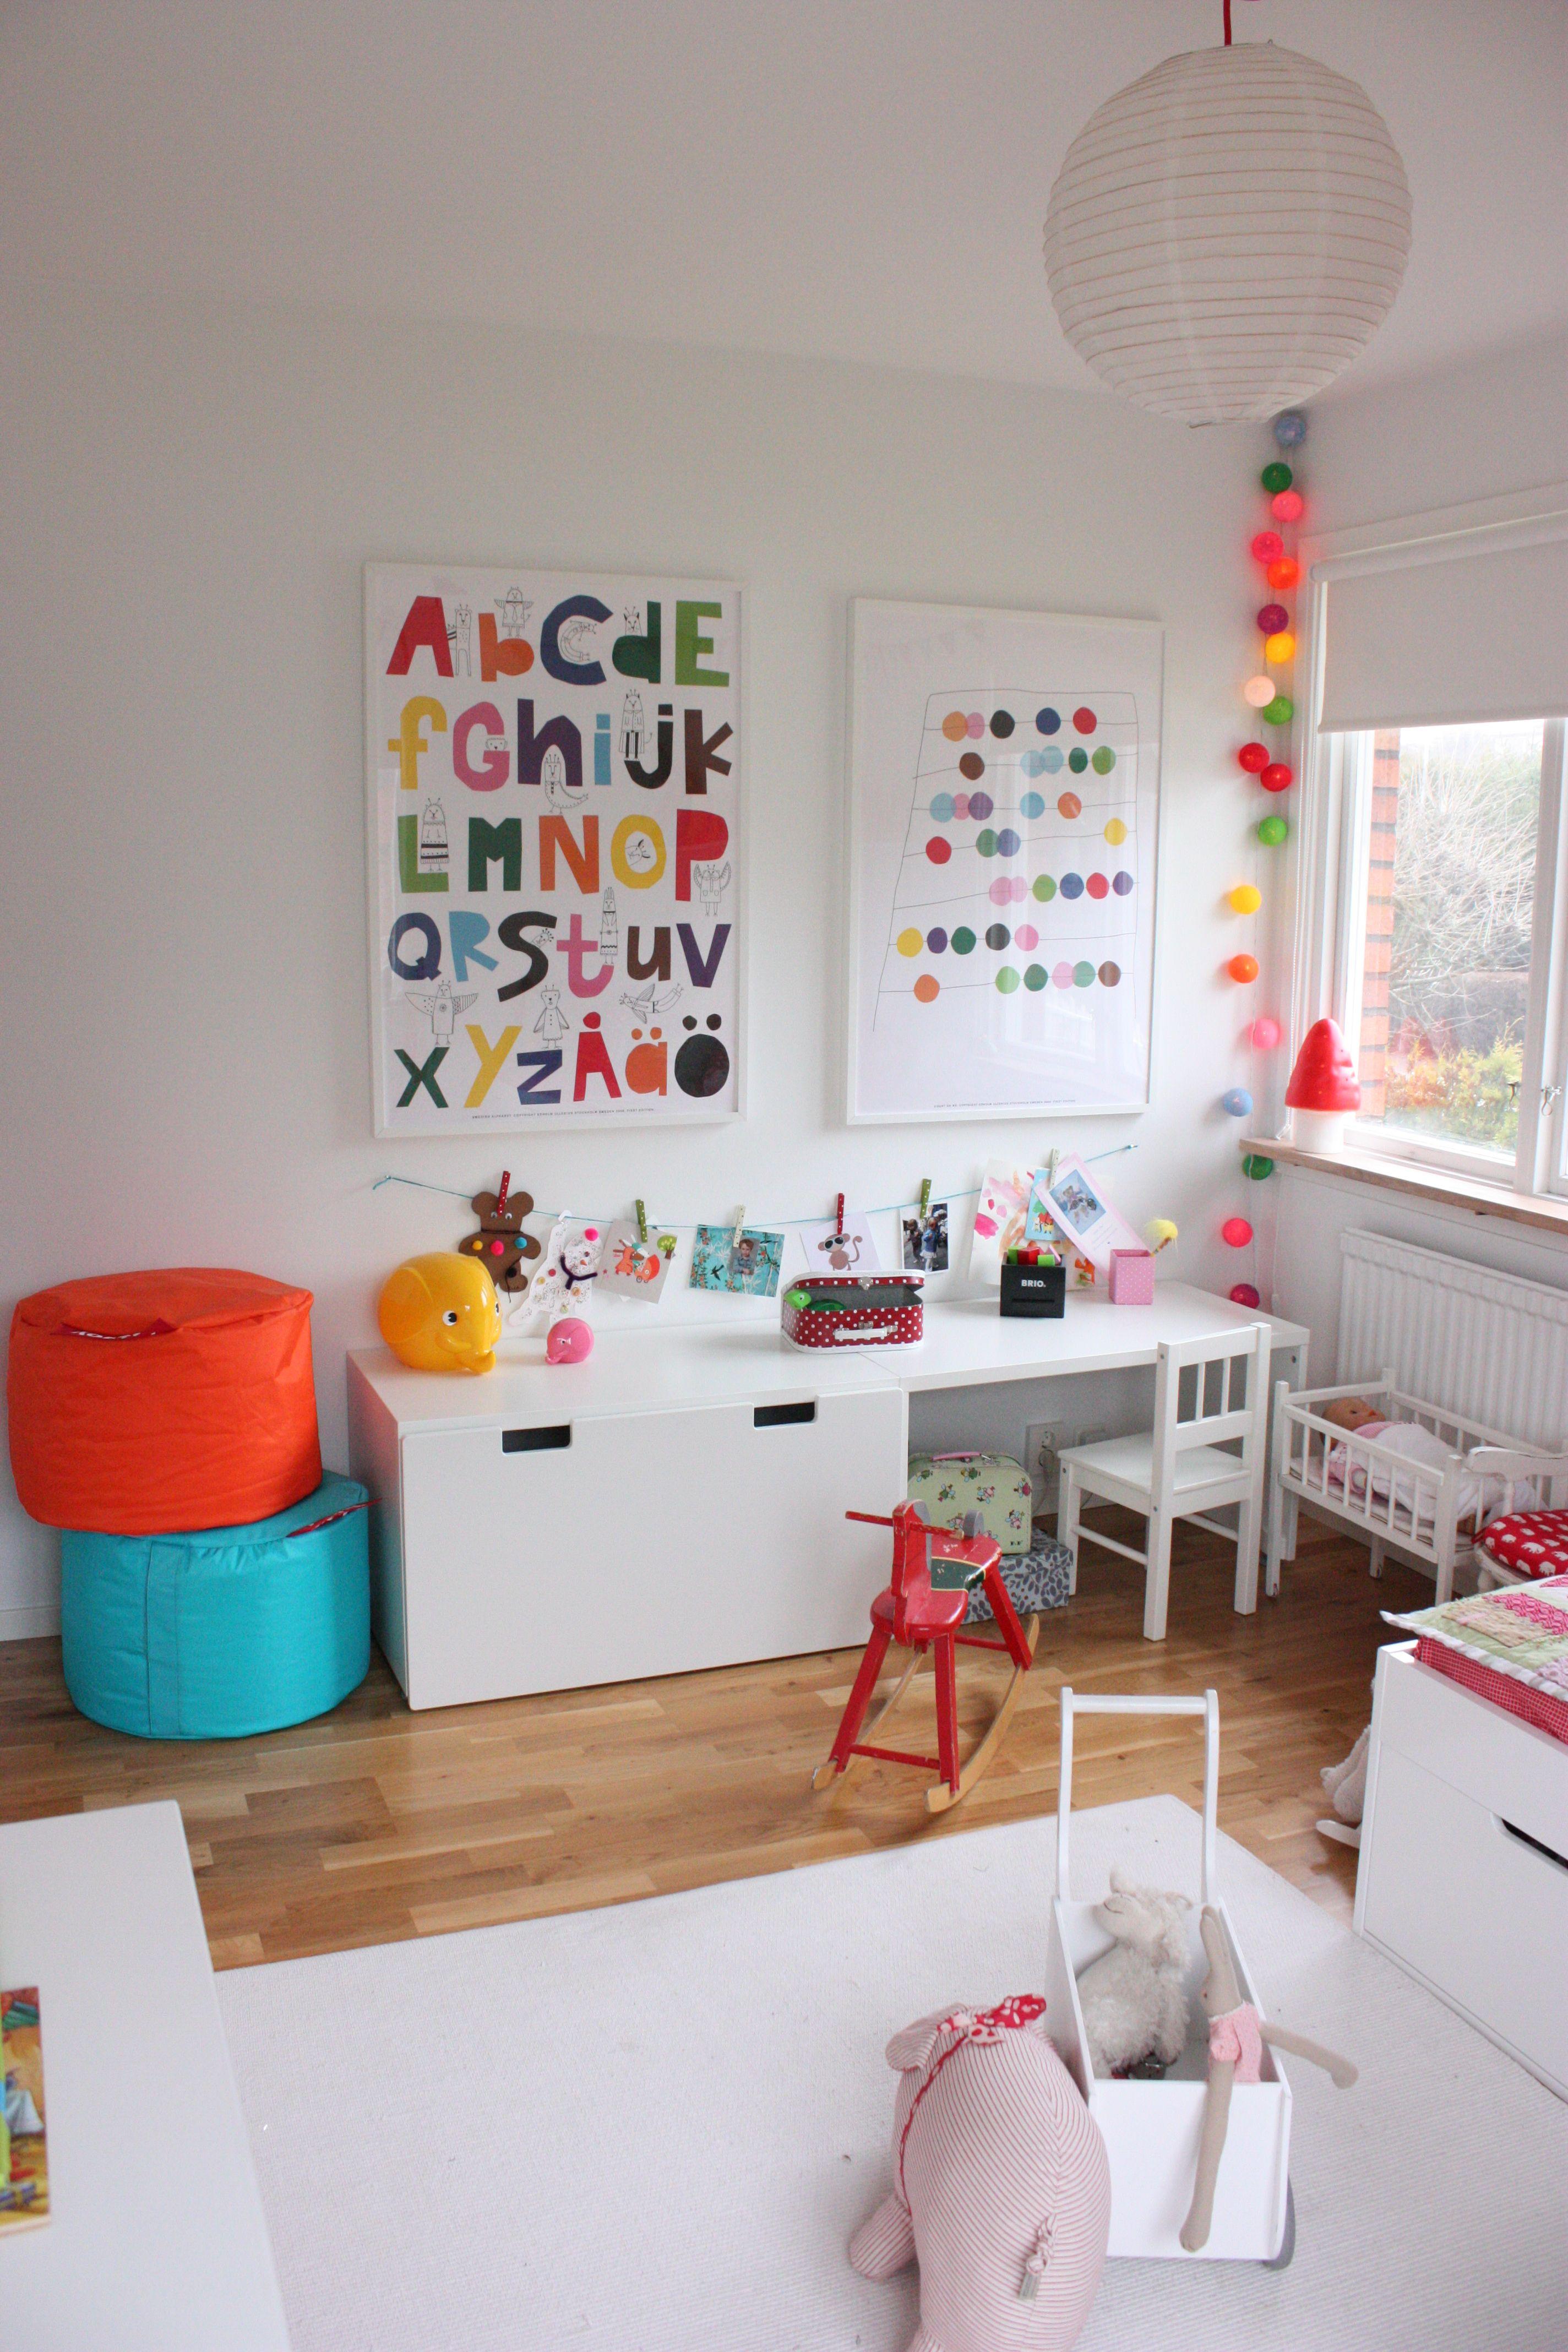 Habitaciones de ikea para niñas. Ikea room for girls | Pinterest ...